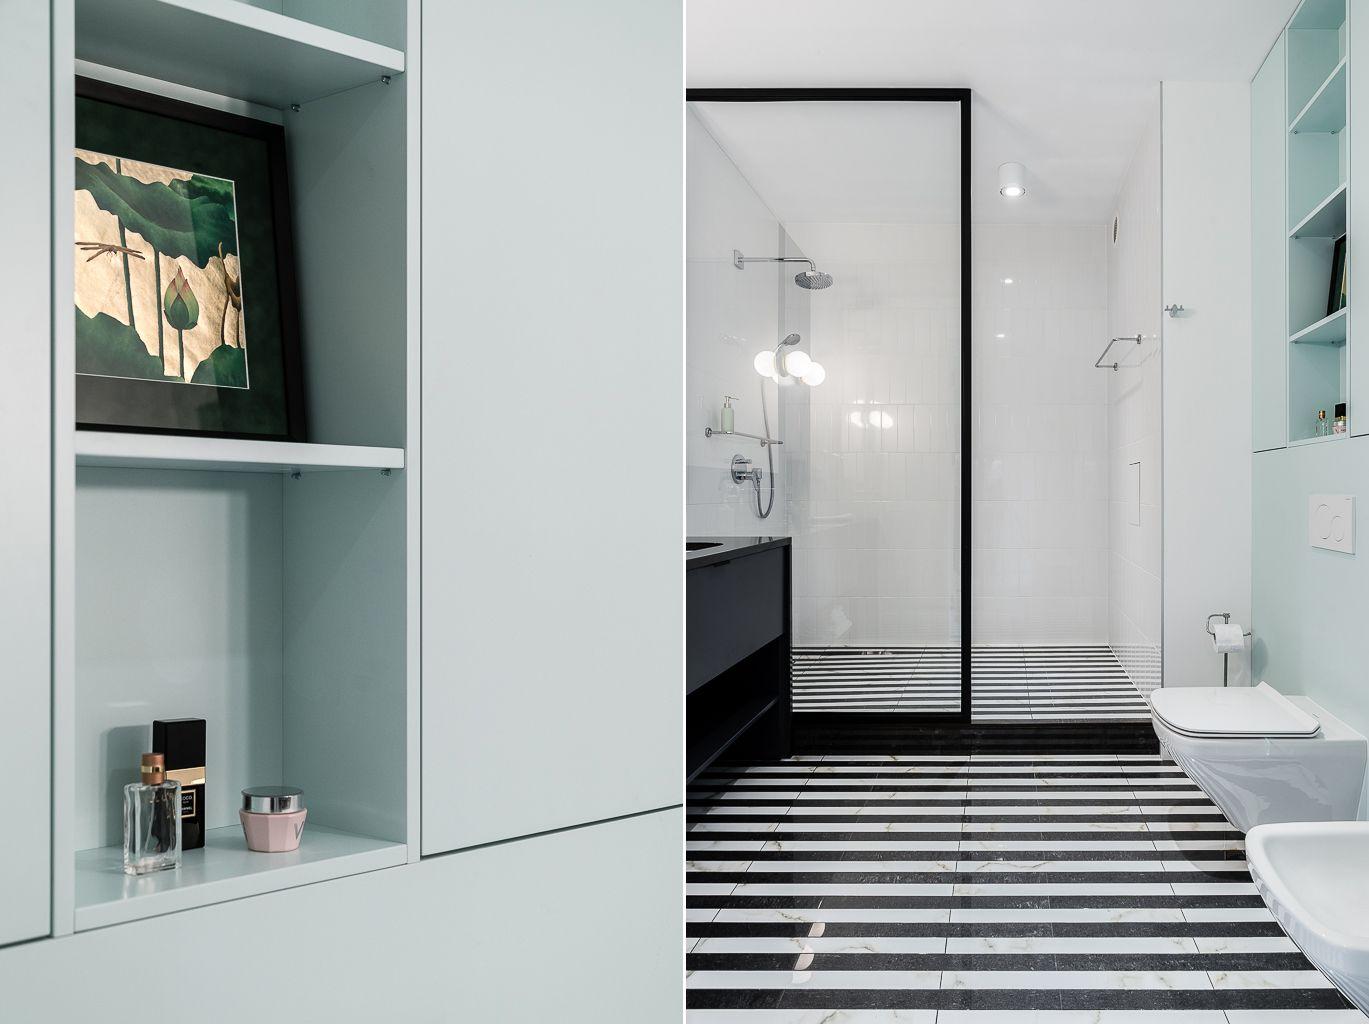 Studio mana design interiors pinterest studio and interiors